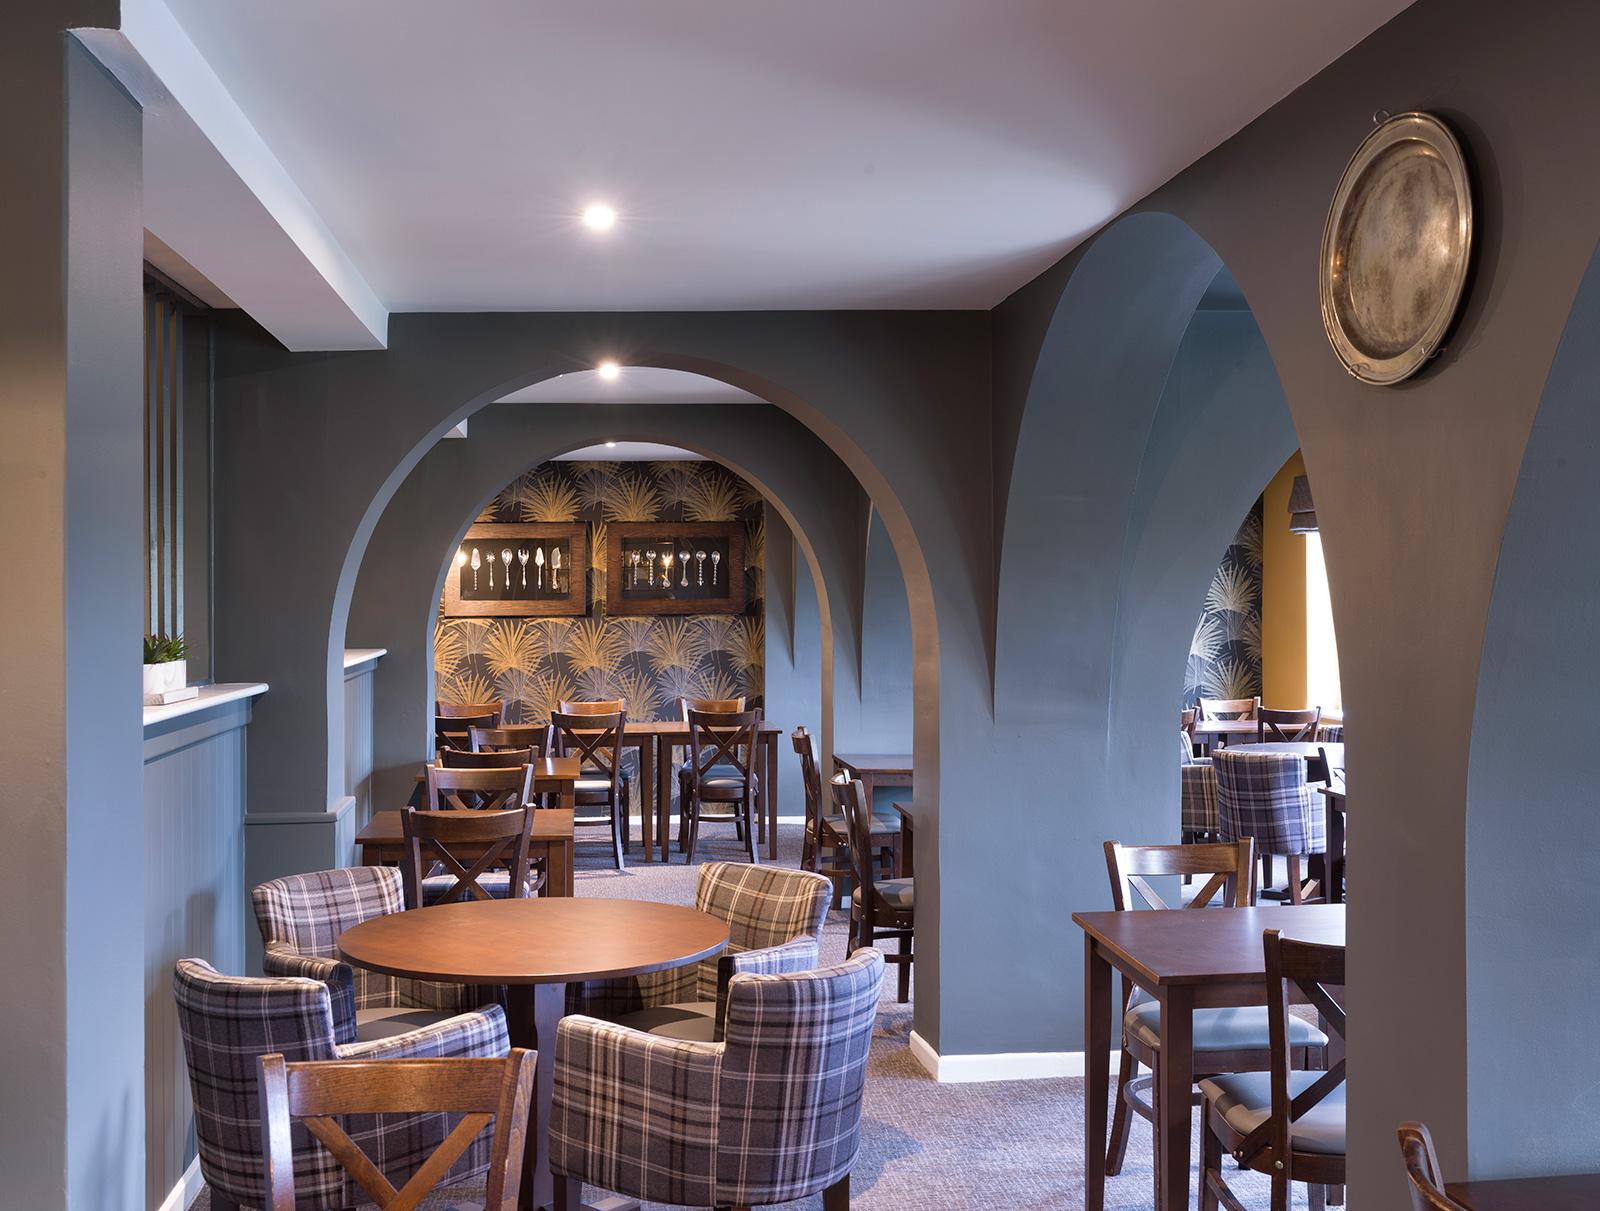 The Bridge House Hotel Bournemouth | Eat, Drink, Sleep